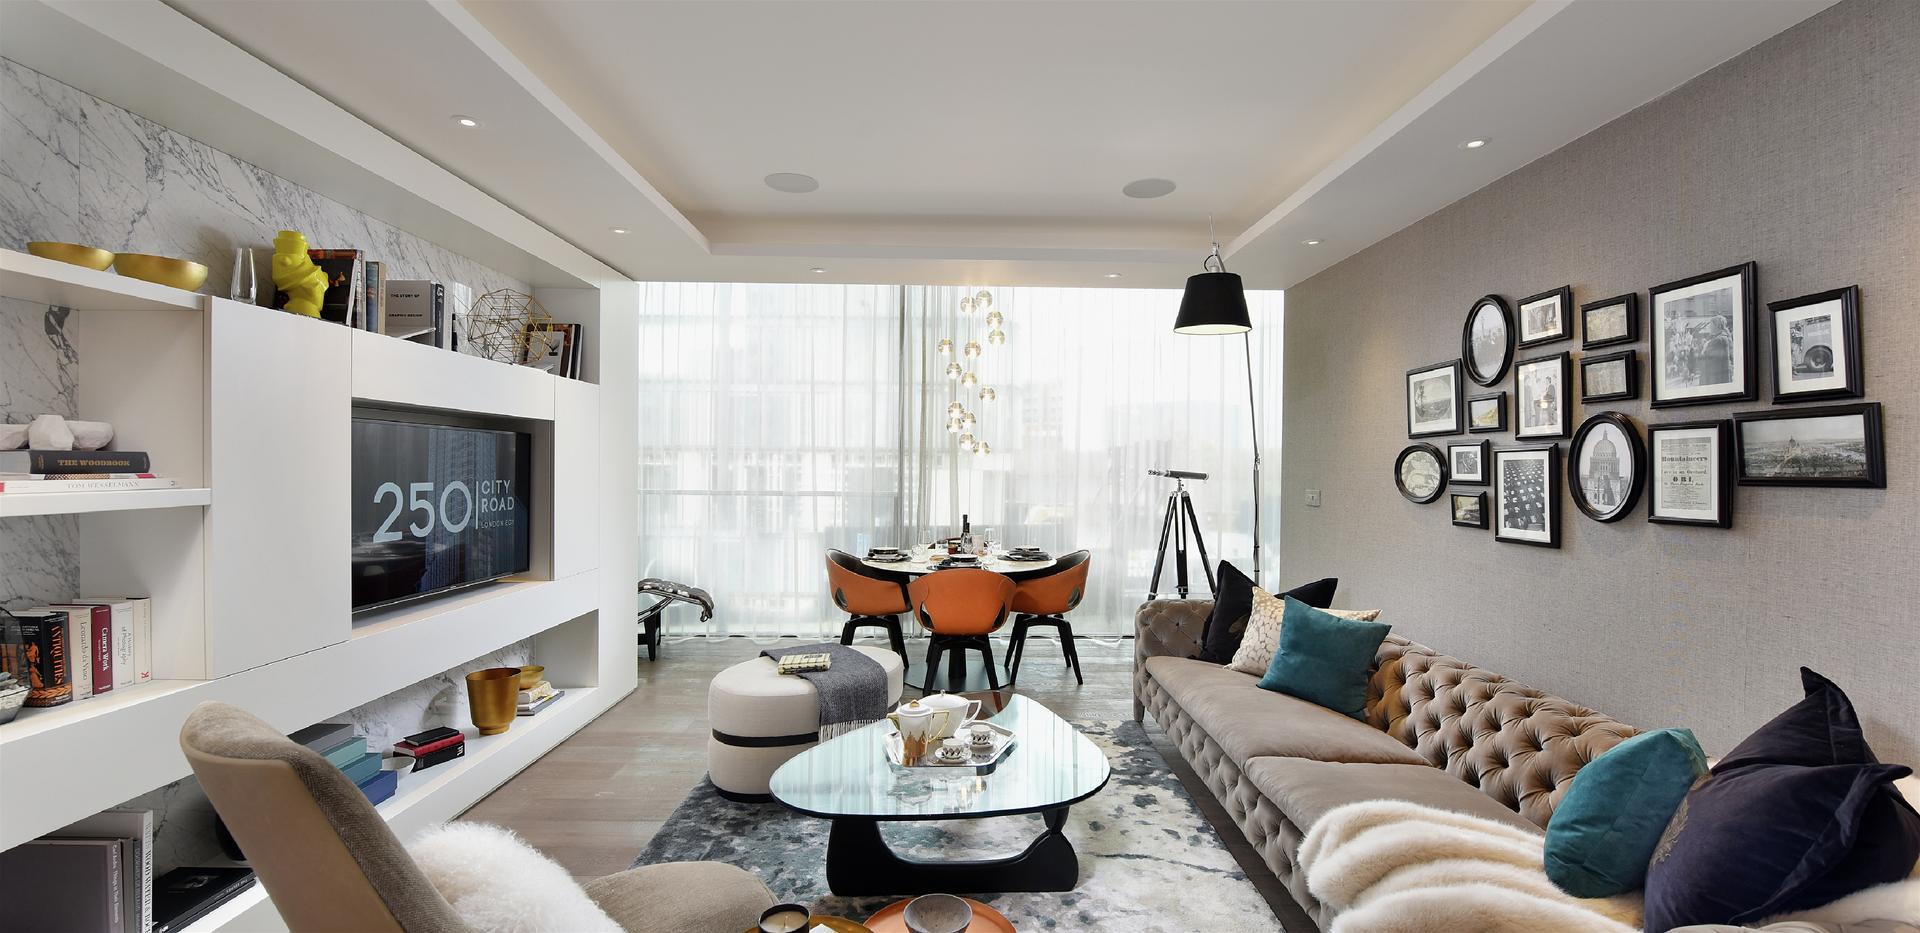 Berkeley, 250 City Road, Islington, Show Apartment, Interior, Living Area